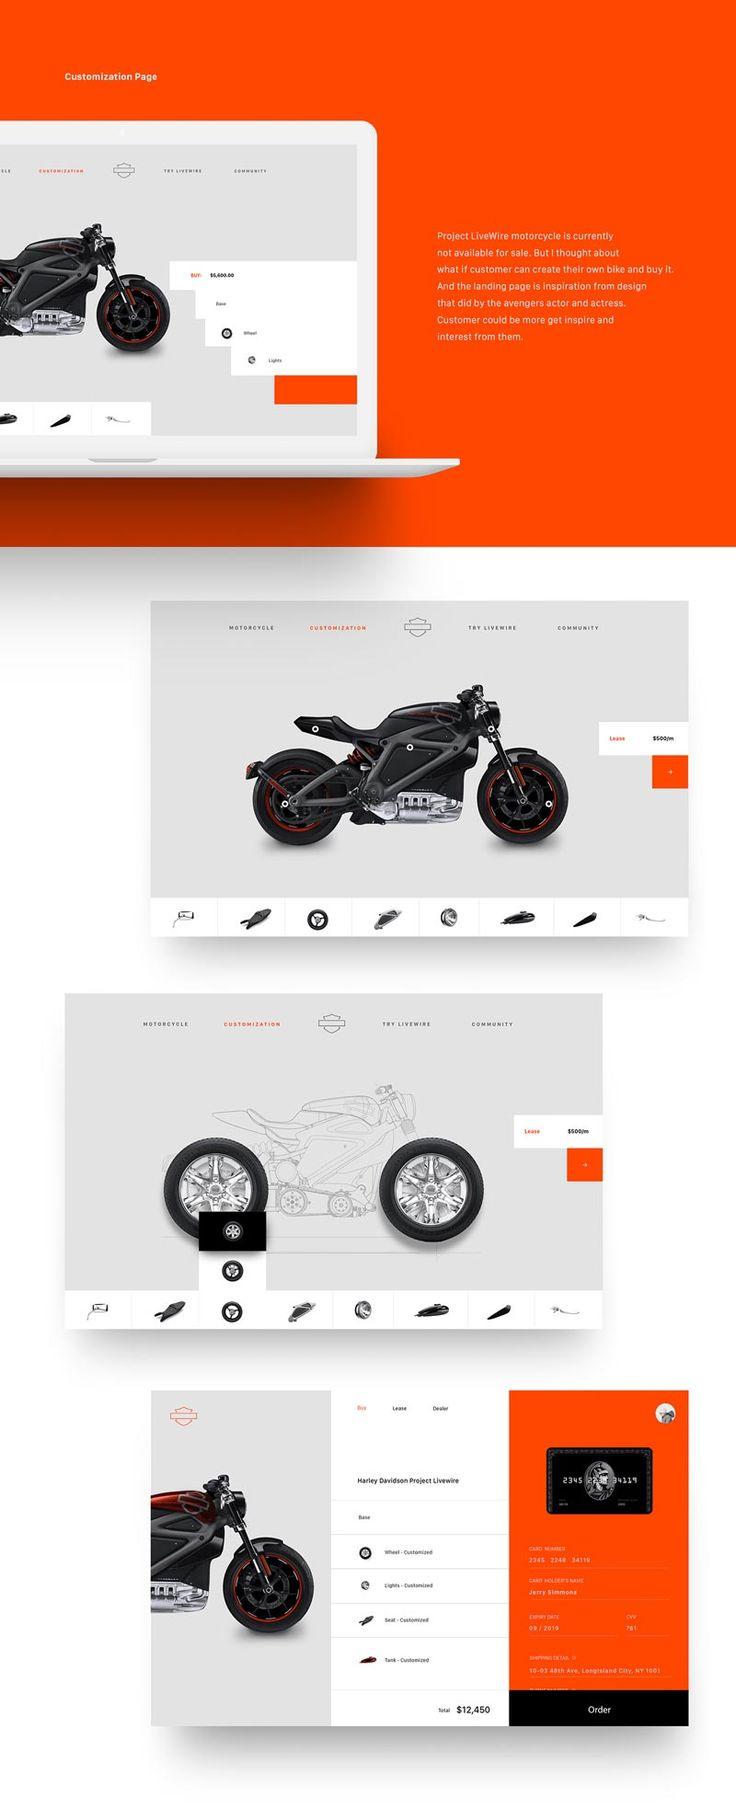 Harley Davidson Motorcycle Website - Behance #ui #ux#userexperience #website #webdesign #design